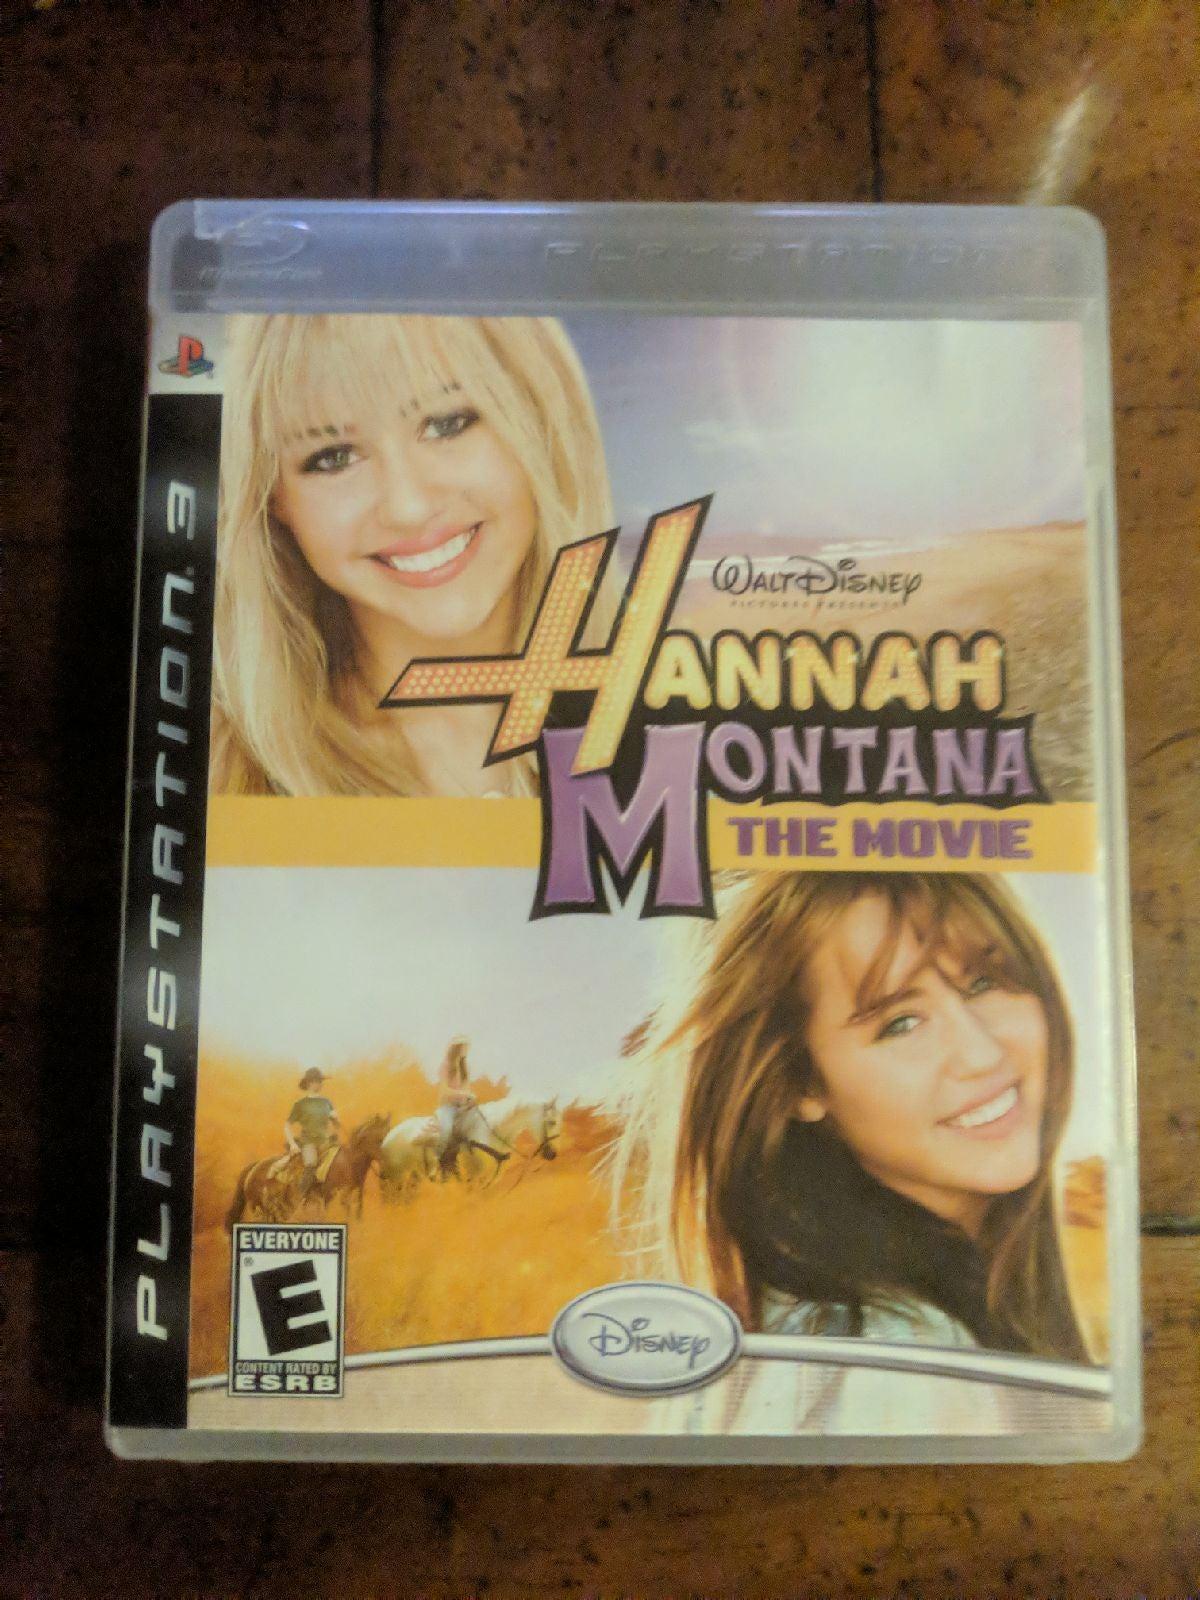 Hannah Montana: The Movie on Playstation